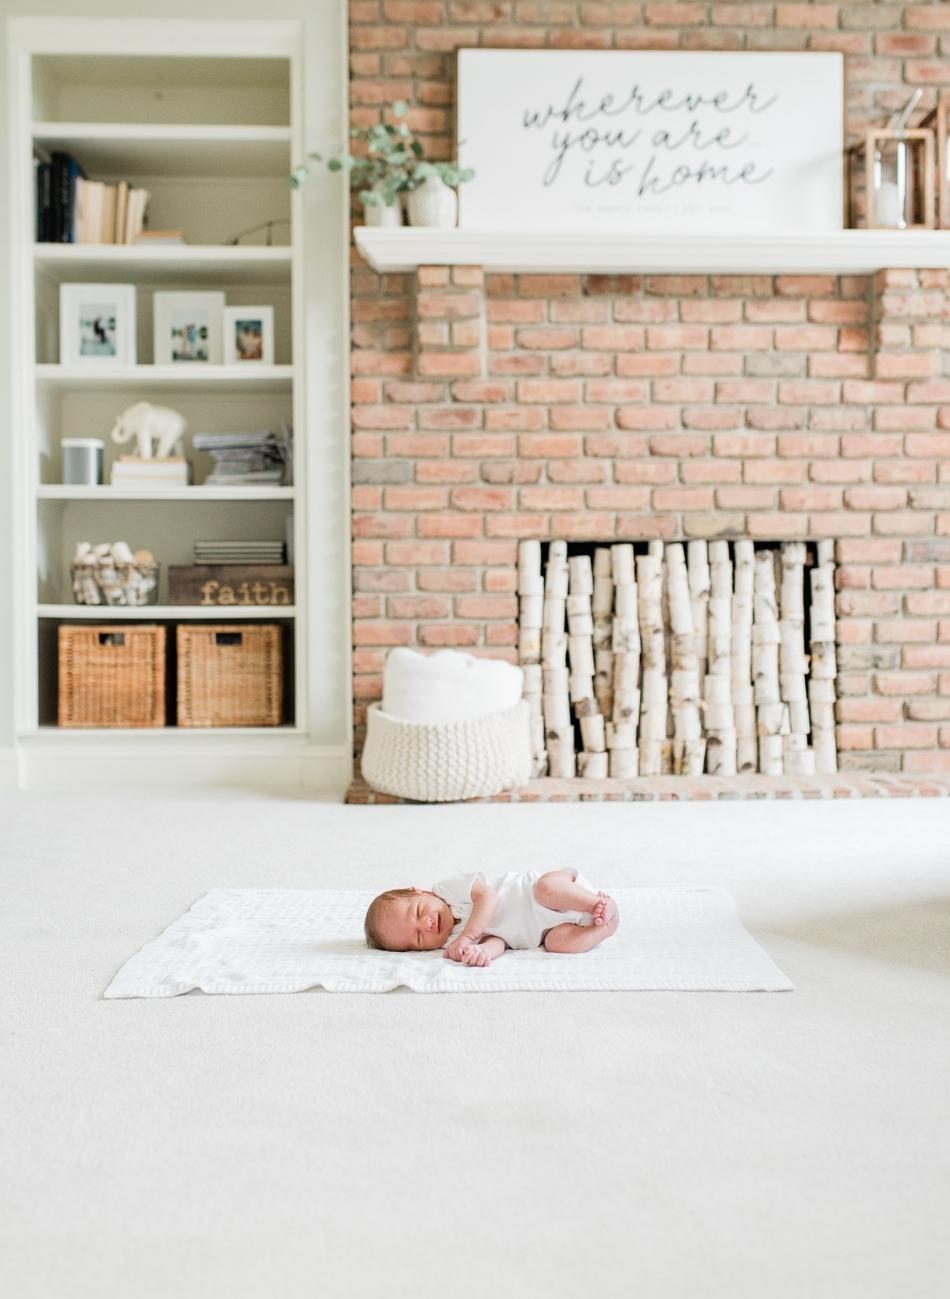 Baltimore-Maryland-lifestyle-newborn-photographer-photos-by-breanna-kuhlmann-#bklp-12.jpg